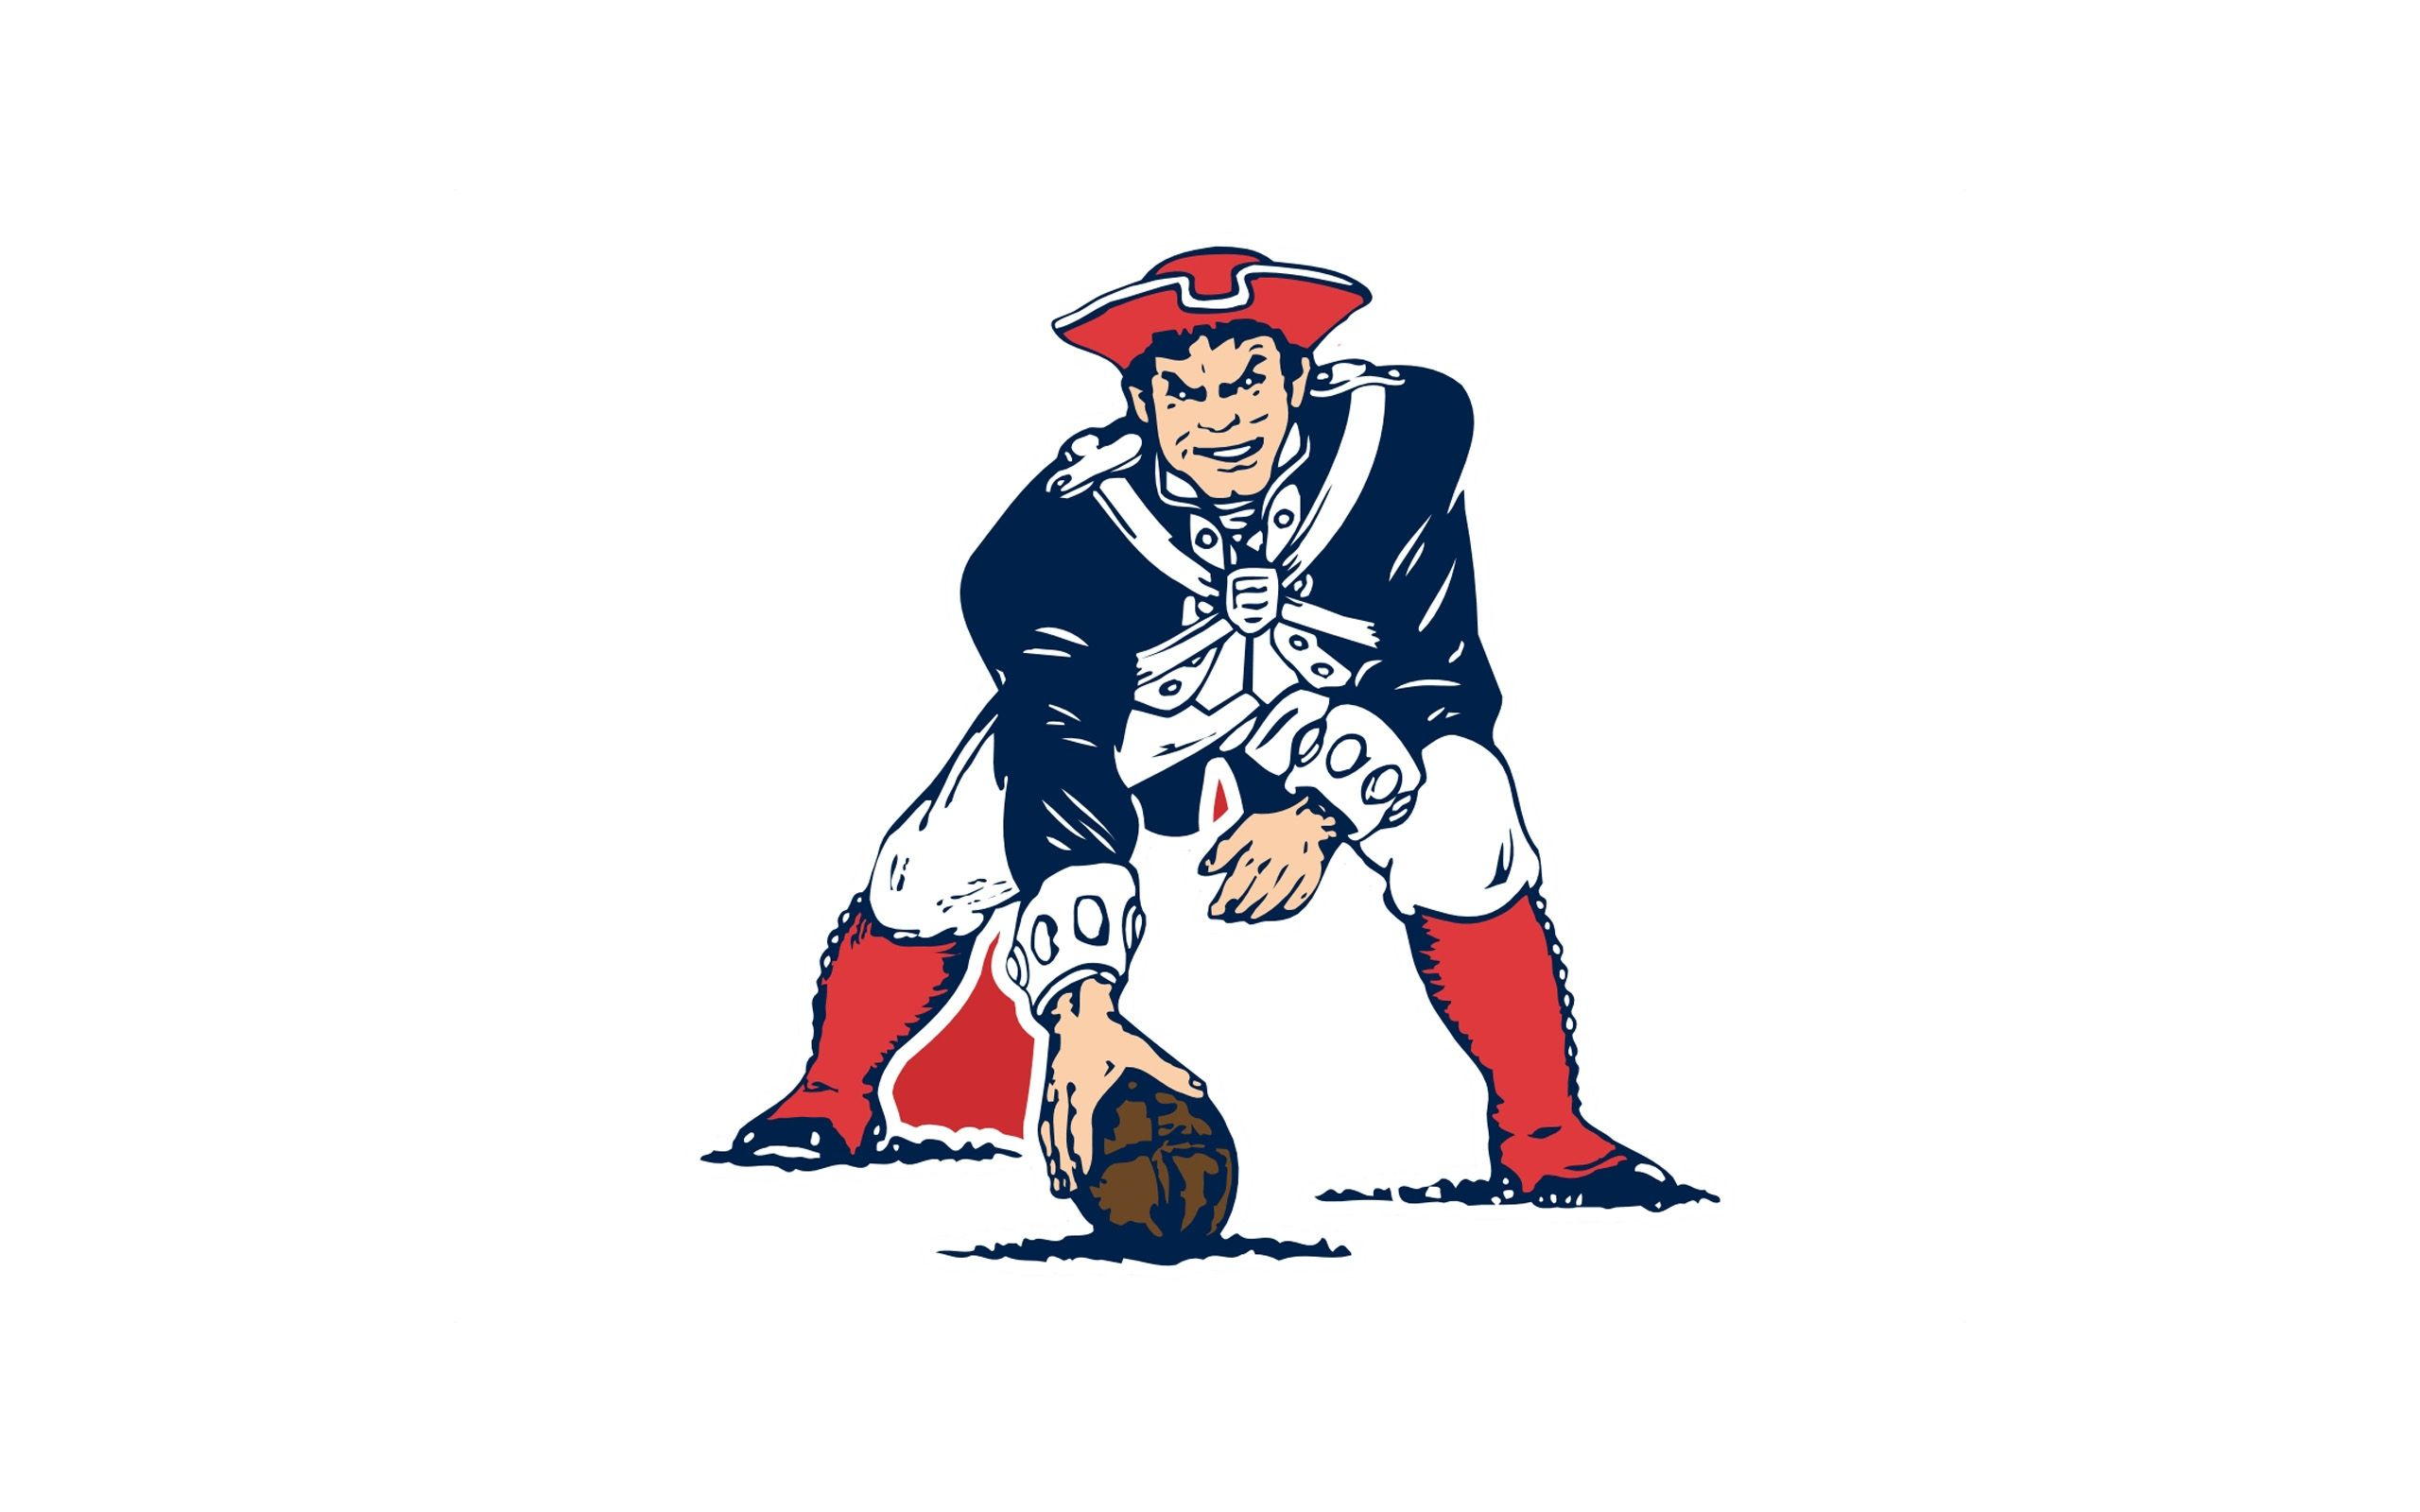 Old New England Patriots Logo Jpg 2560 1600 New England